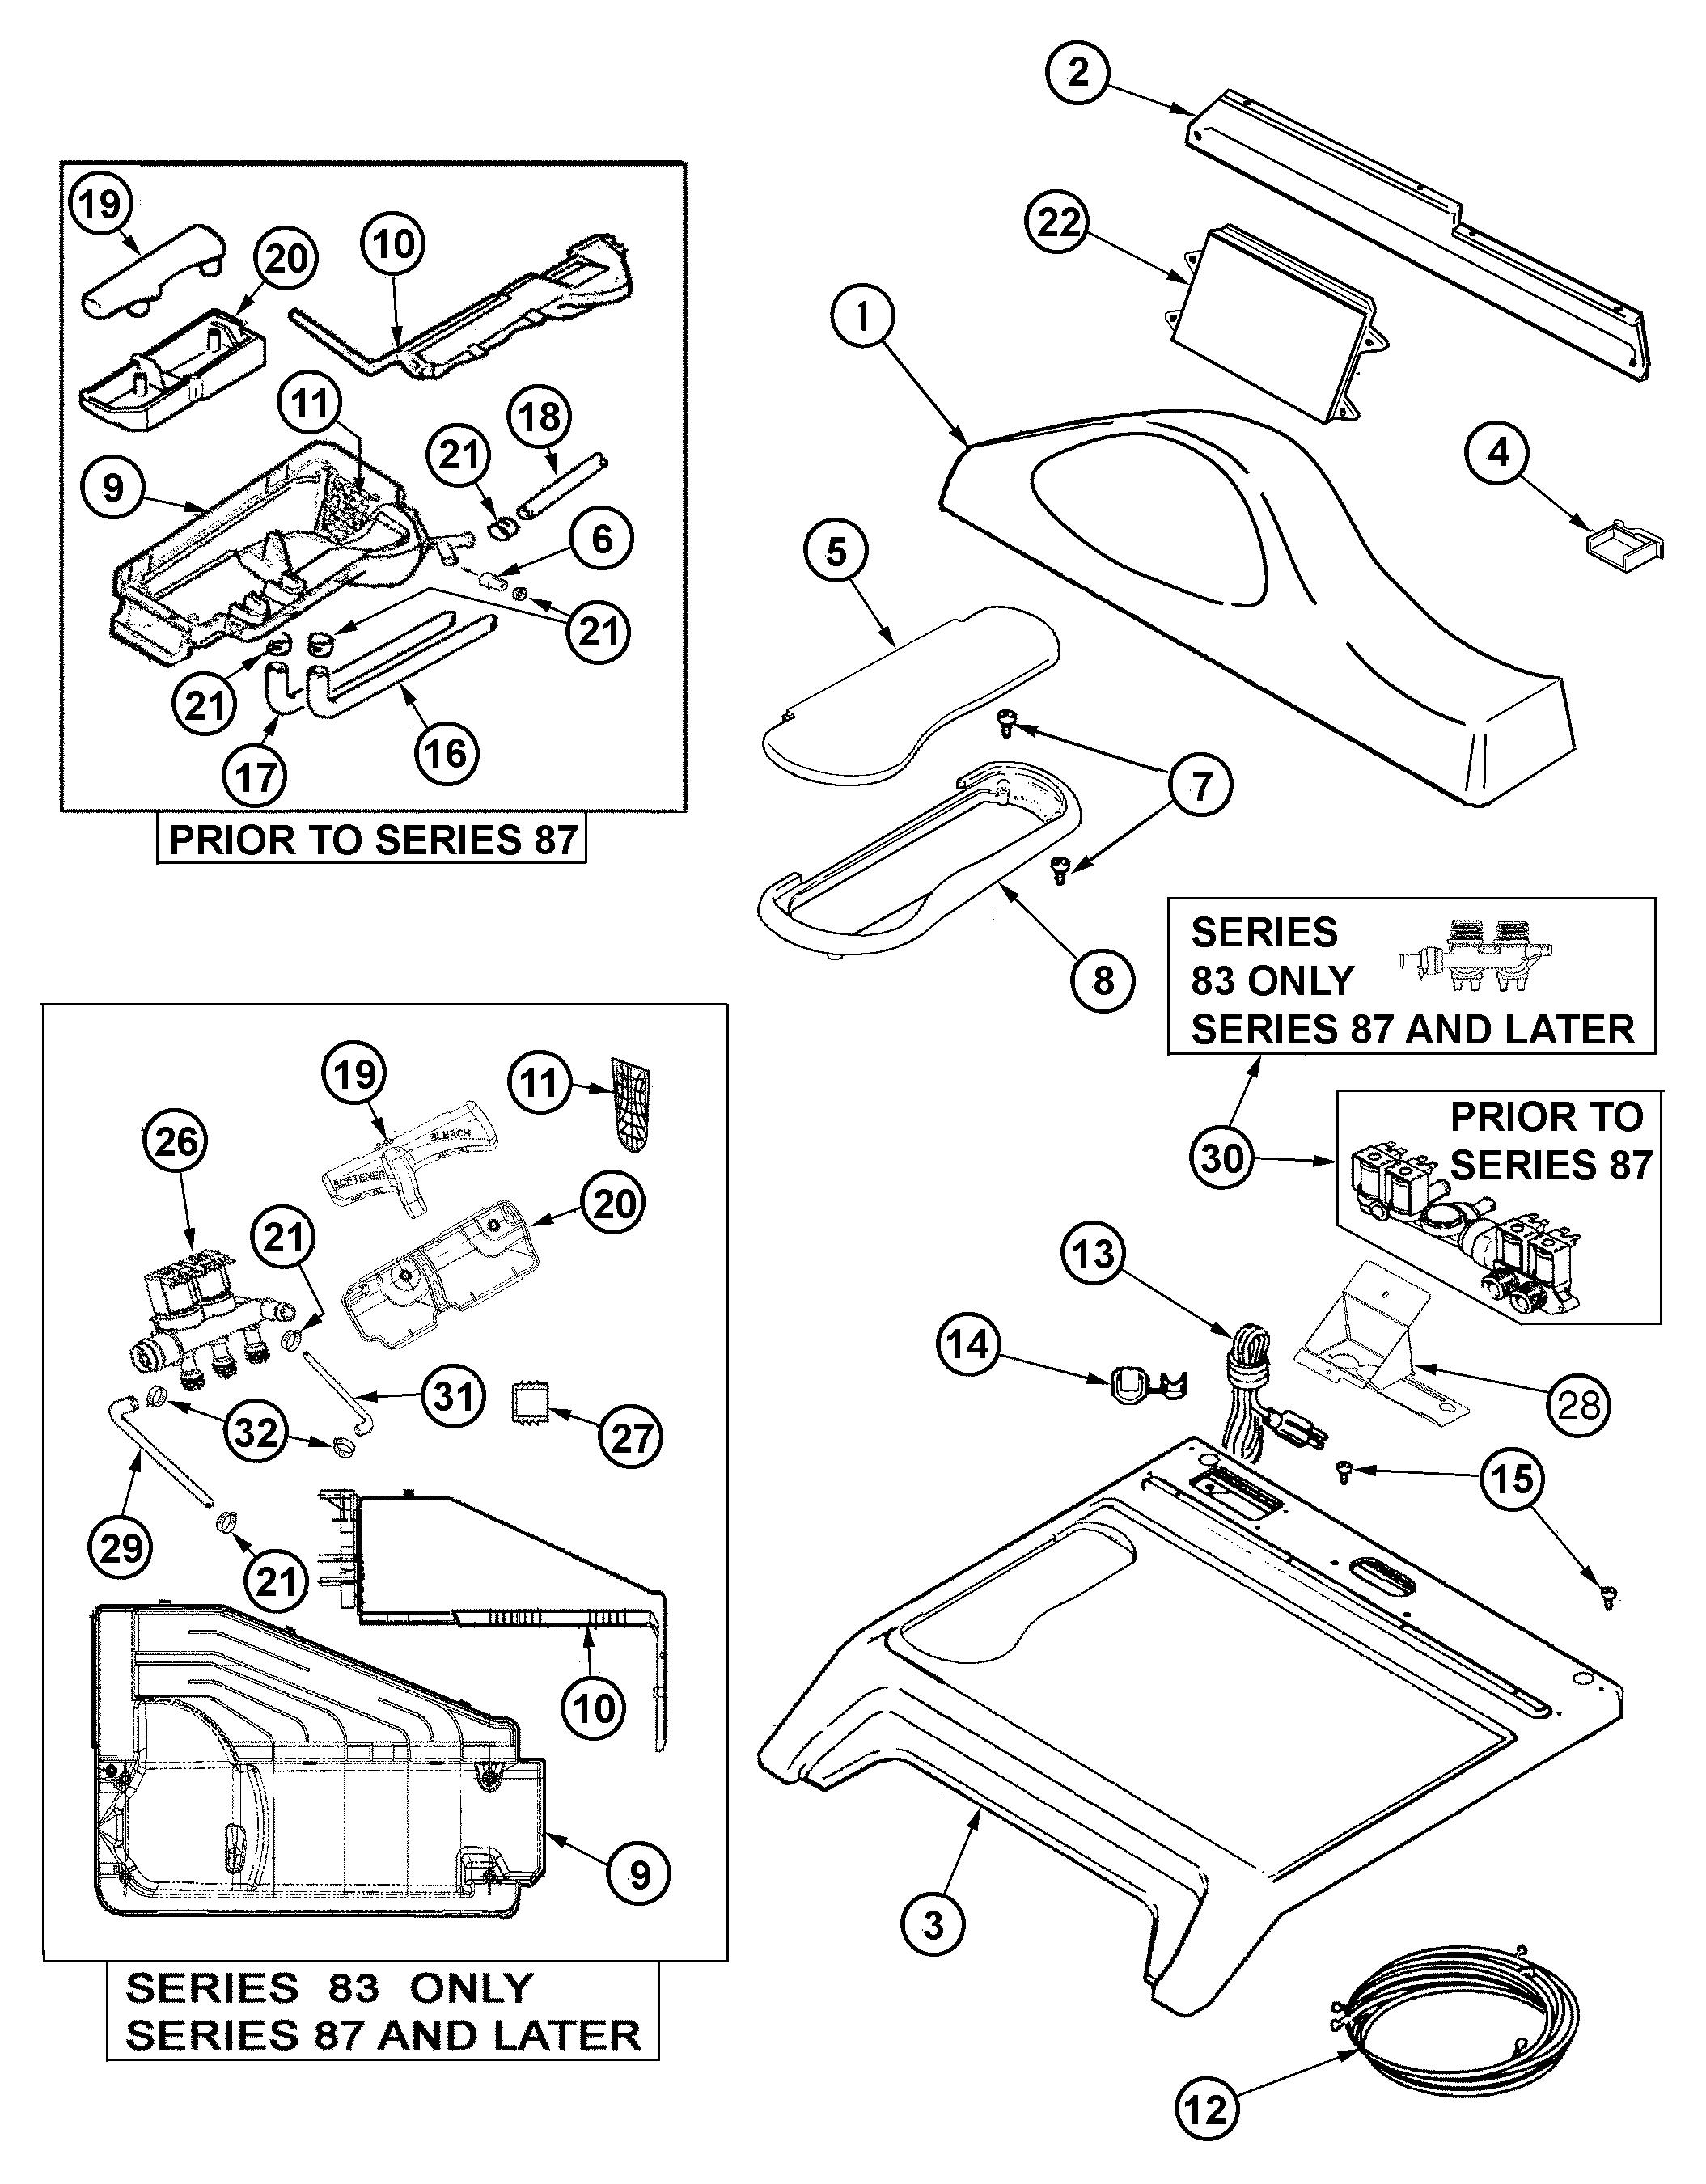 maytag neptune washer manual door release